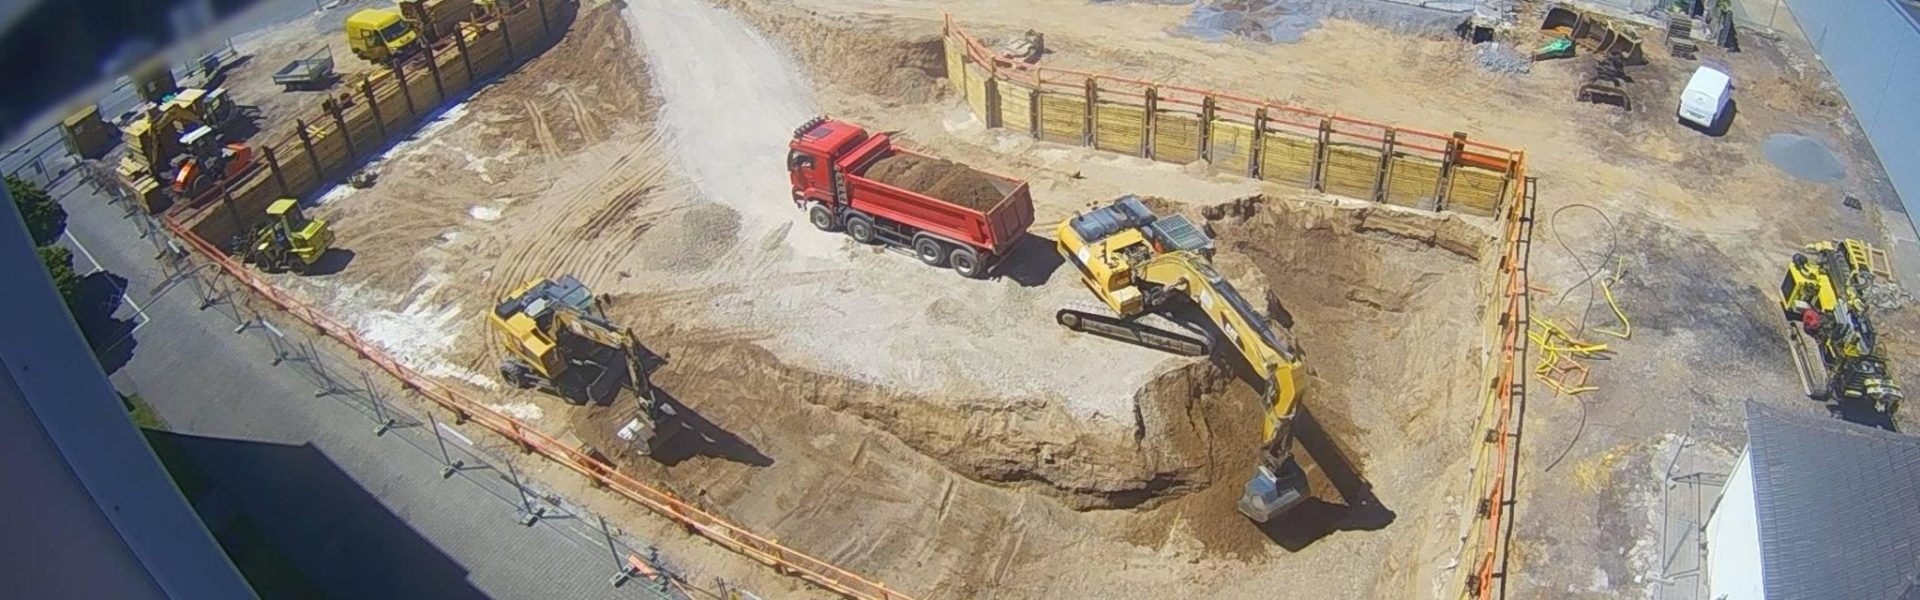 Tiefbauarbeiten Produktionsgebäude Finzelberg